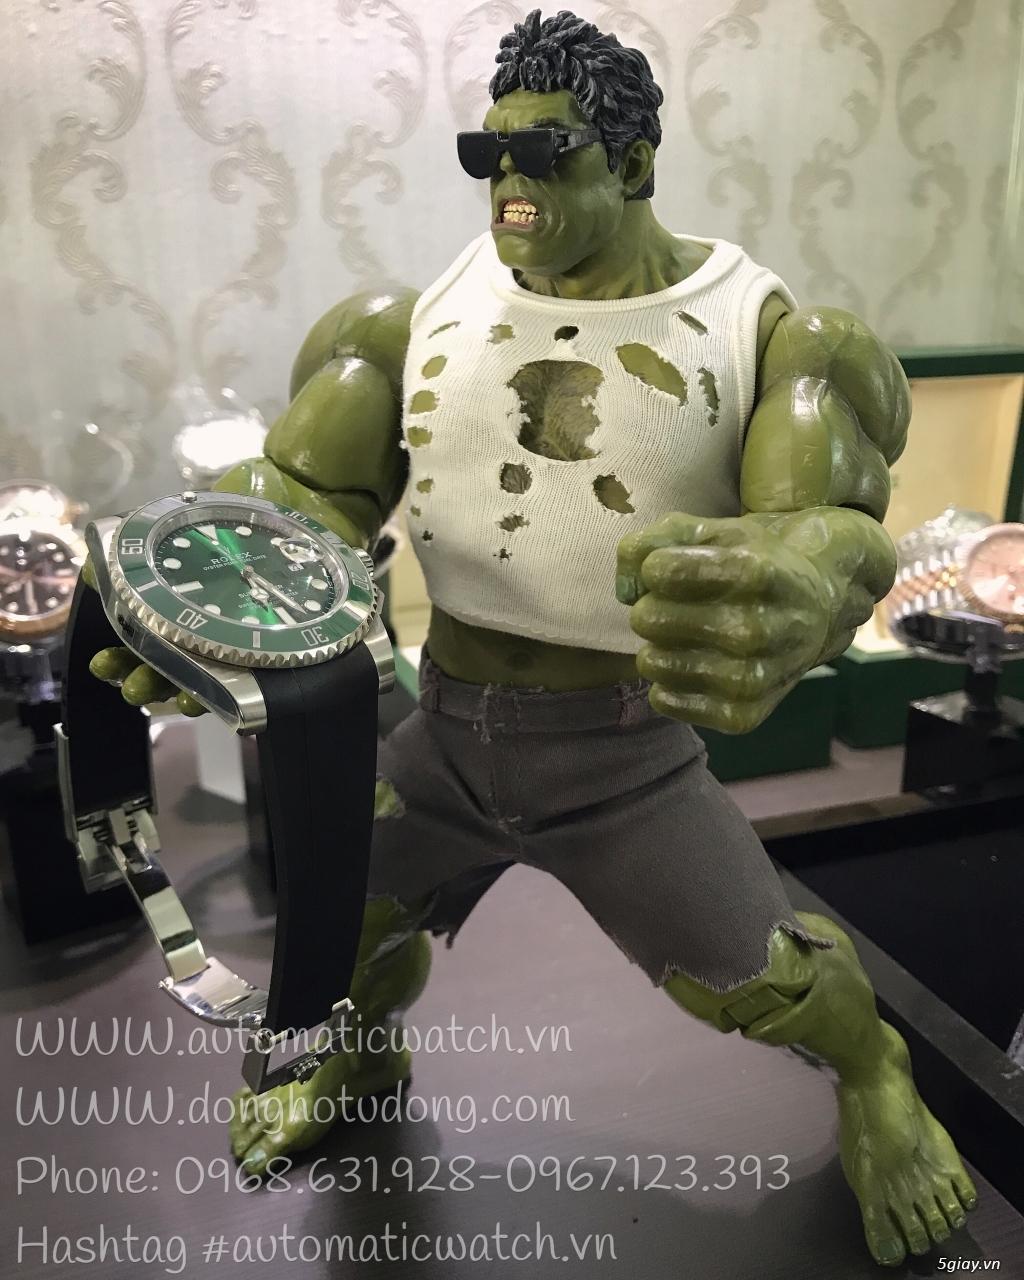 Chuyên đồng hồ Rolex,Hublot,AP, Patek Philippe...Replica1:1 Swiss Made - 36